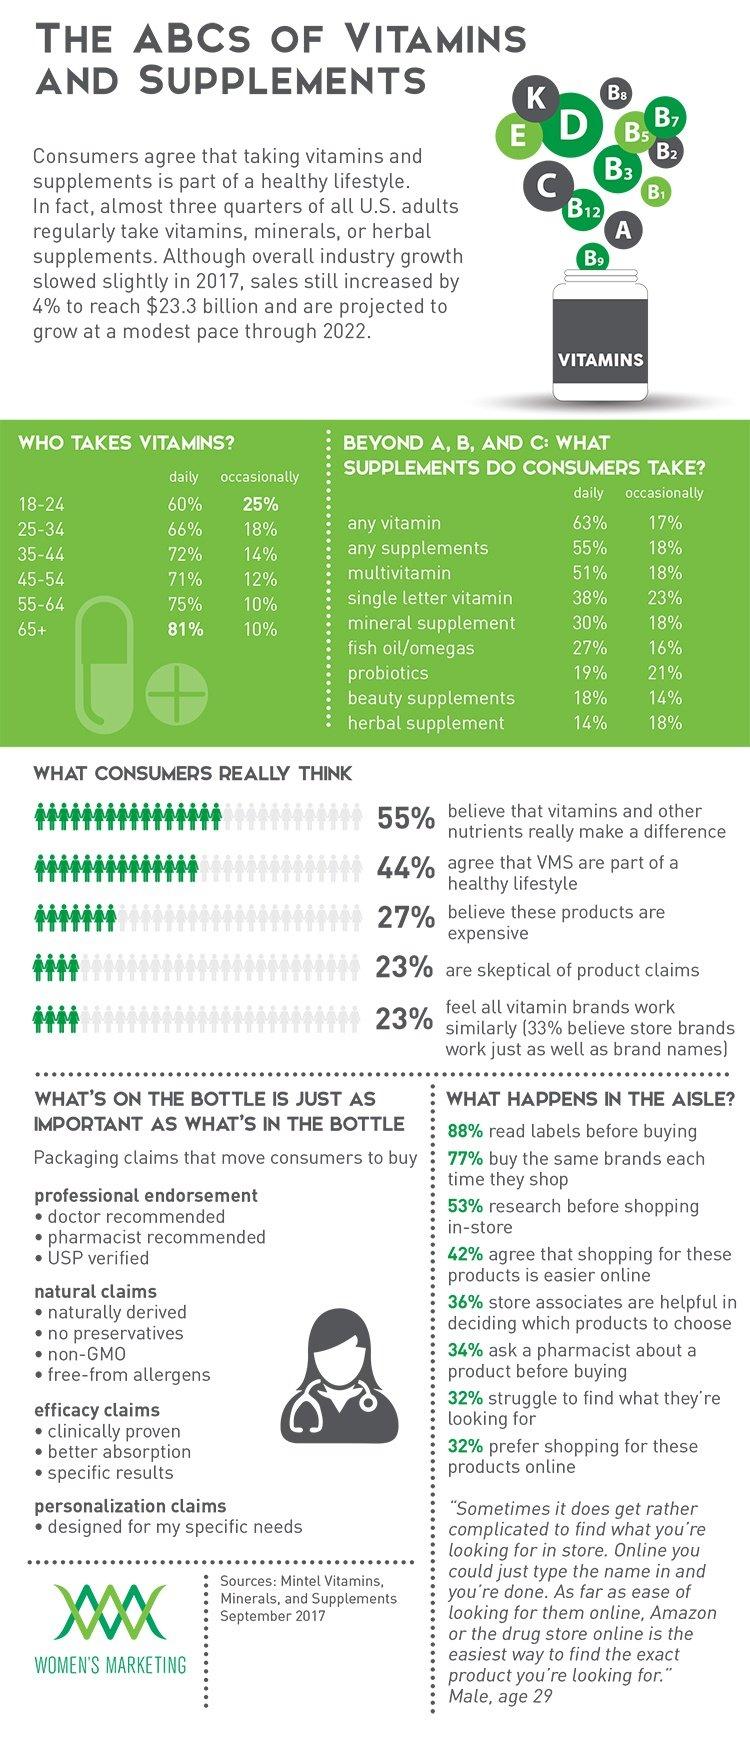 ABC'sofVitamins_Infographic-1